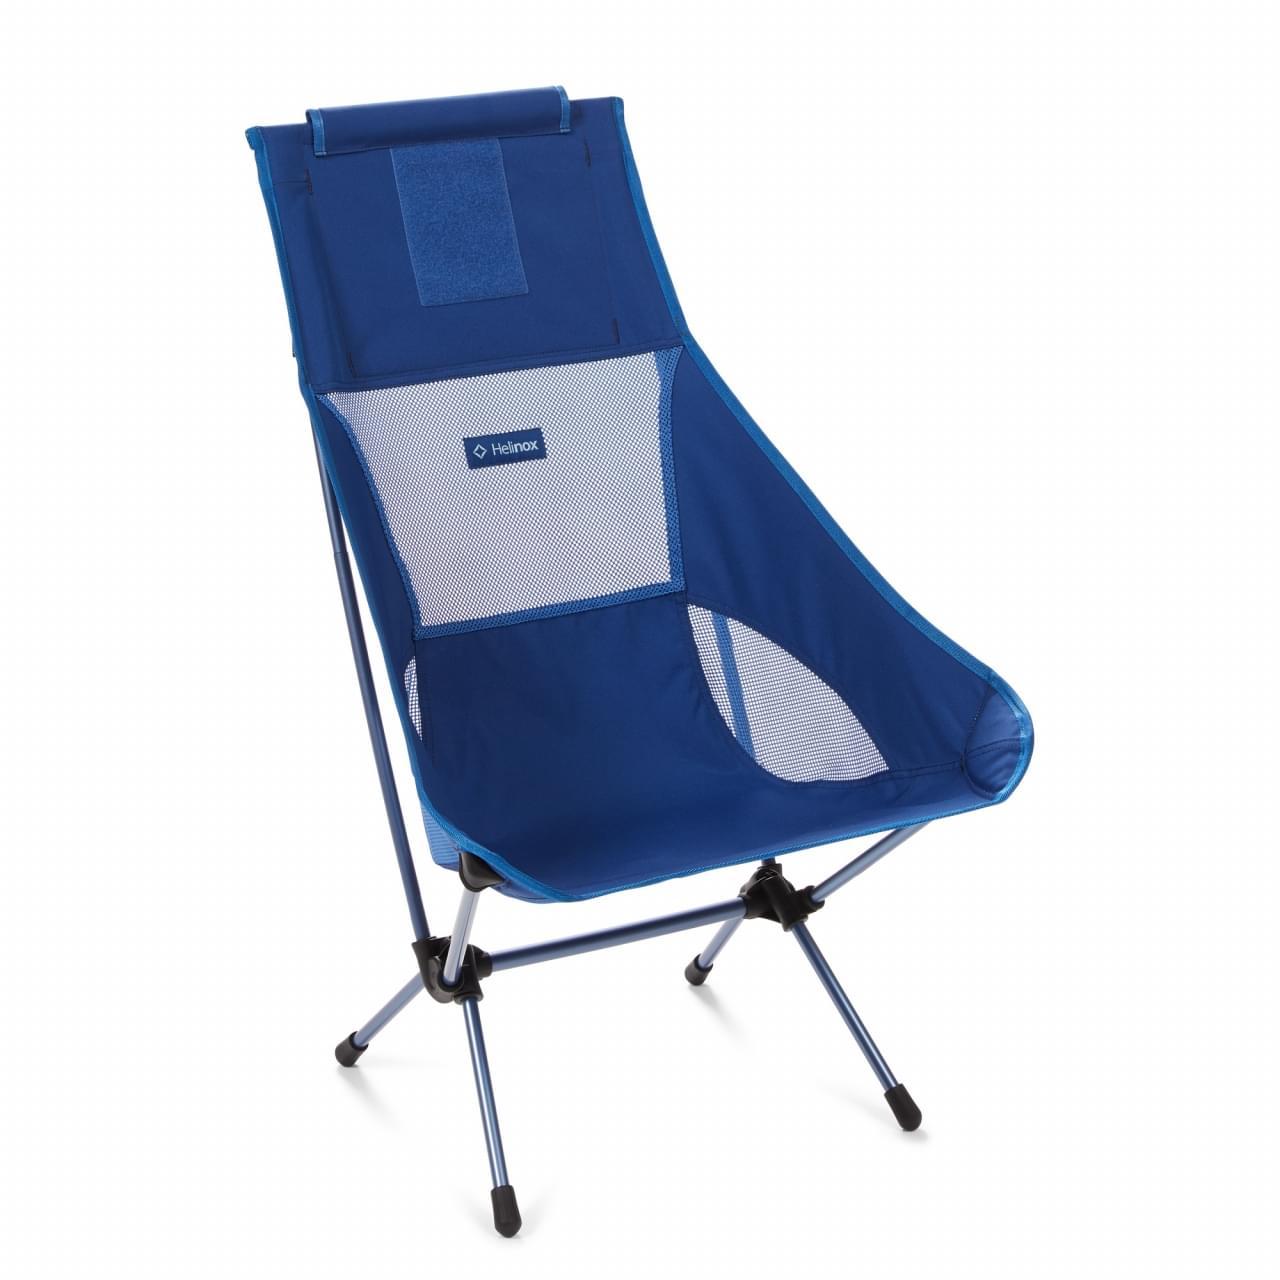 Helinox Chair Two Block Lichtgewicht Stoel - Blauw